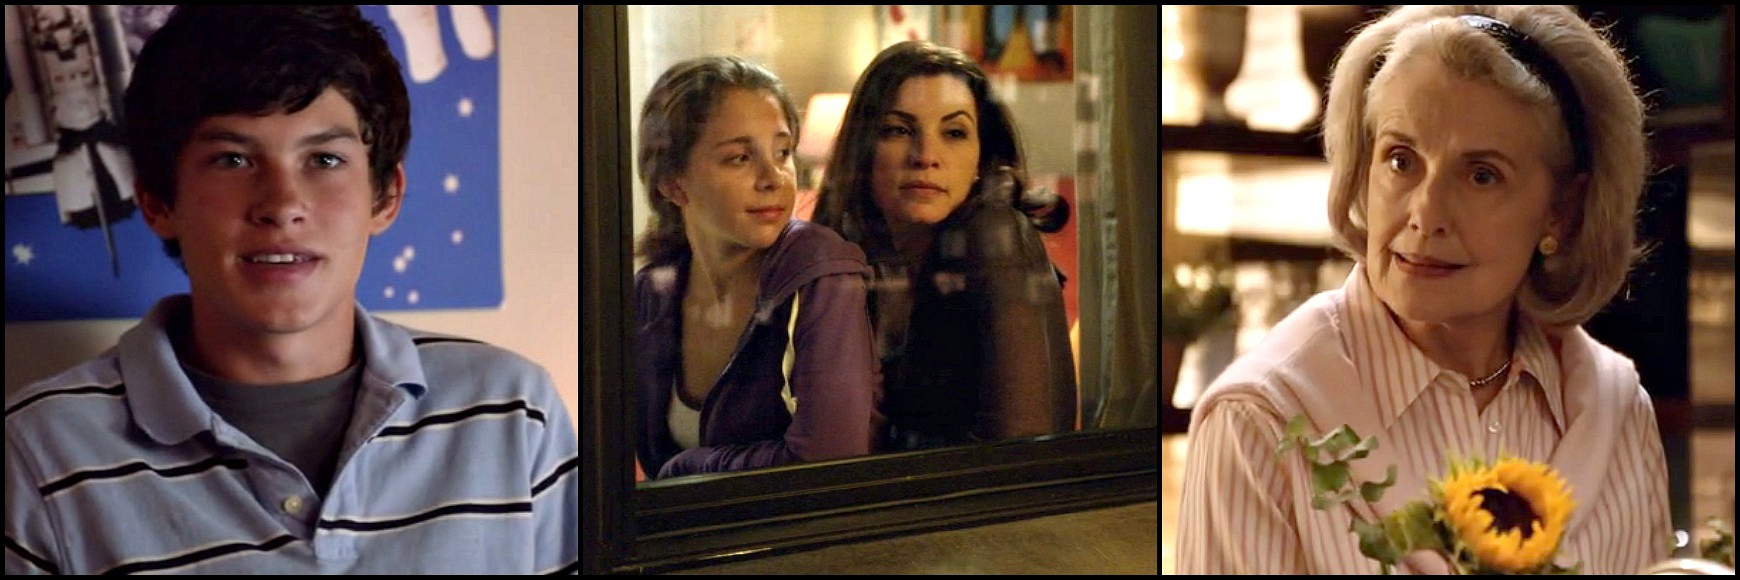 The Good Wife Binge-Watch Guide: Season 1